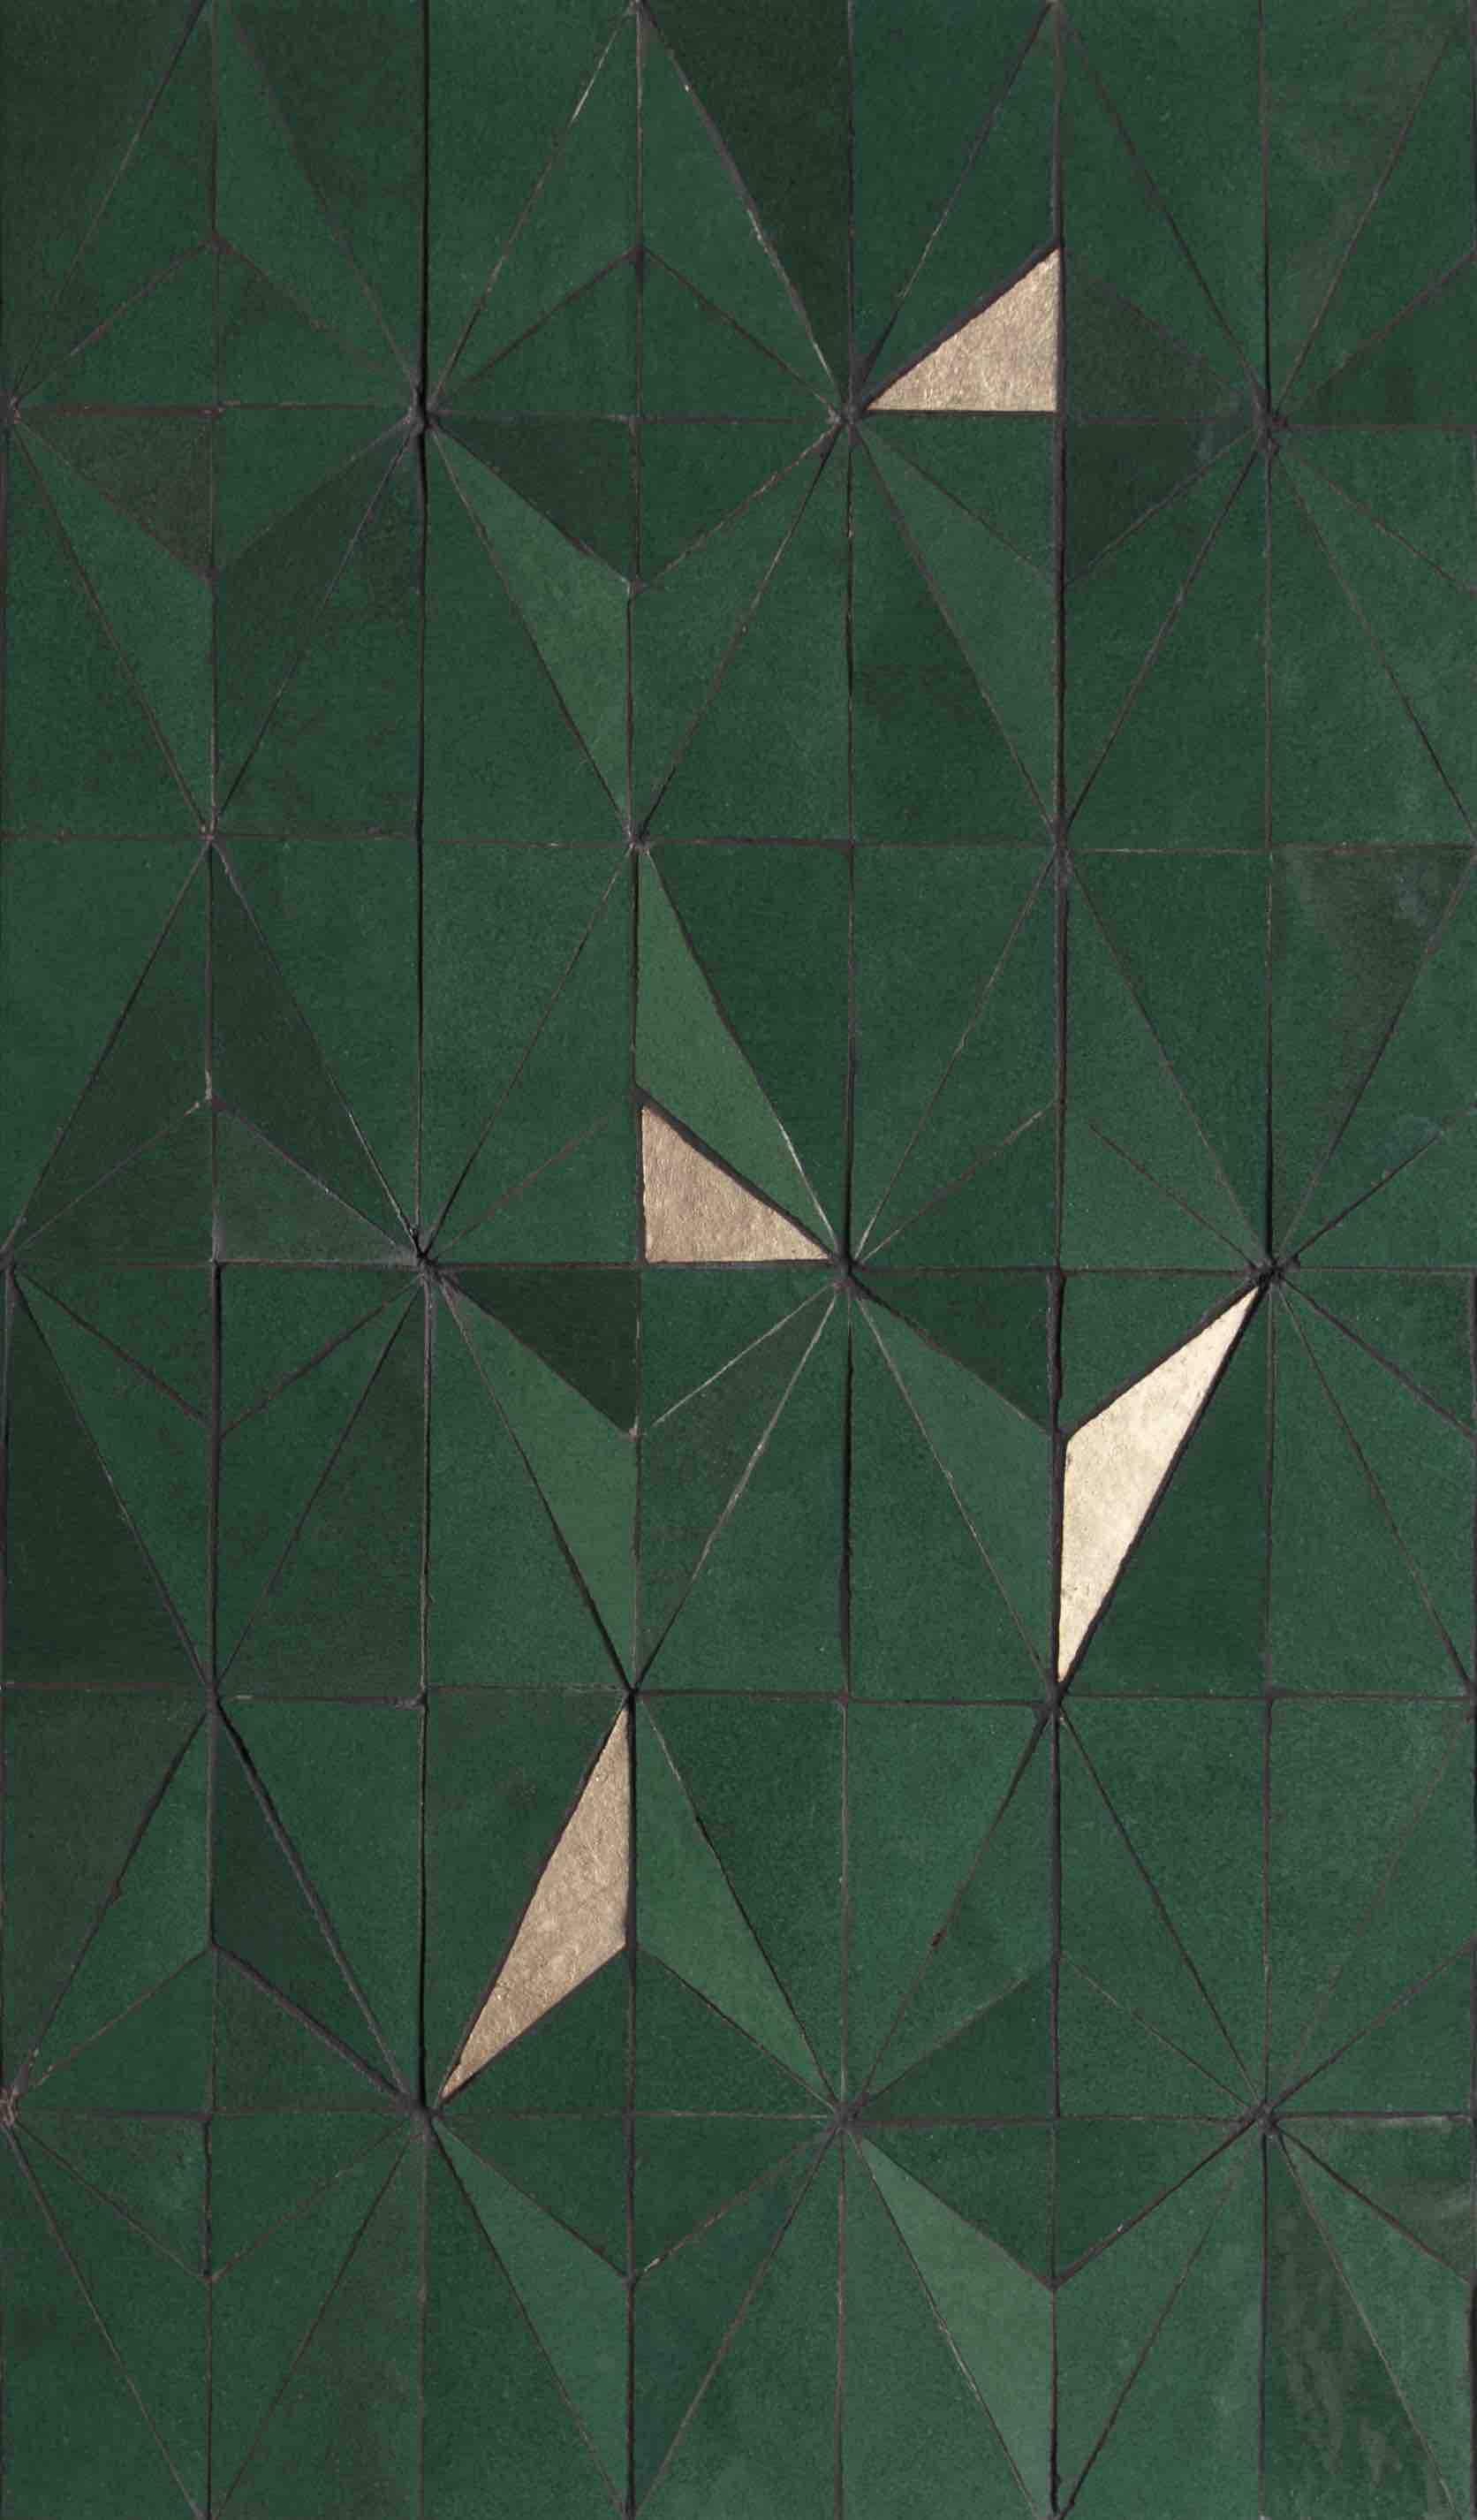 Zellige Creative Samir Mazer Avec Images Tuiles Vertes Deco